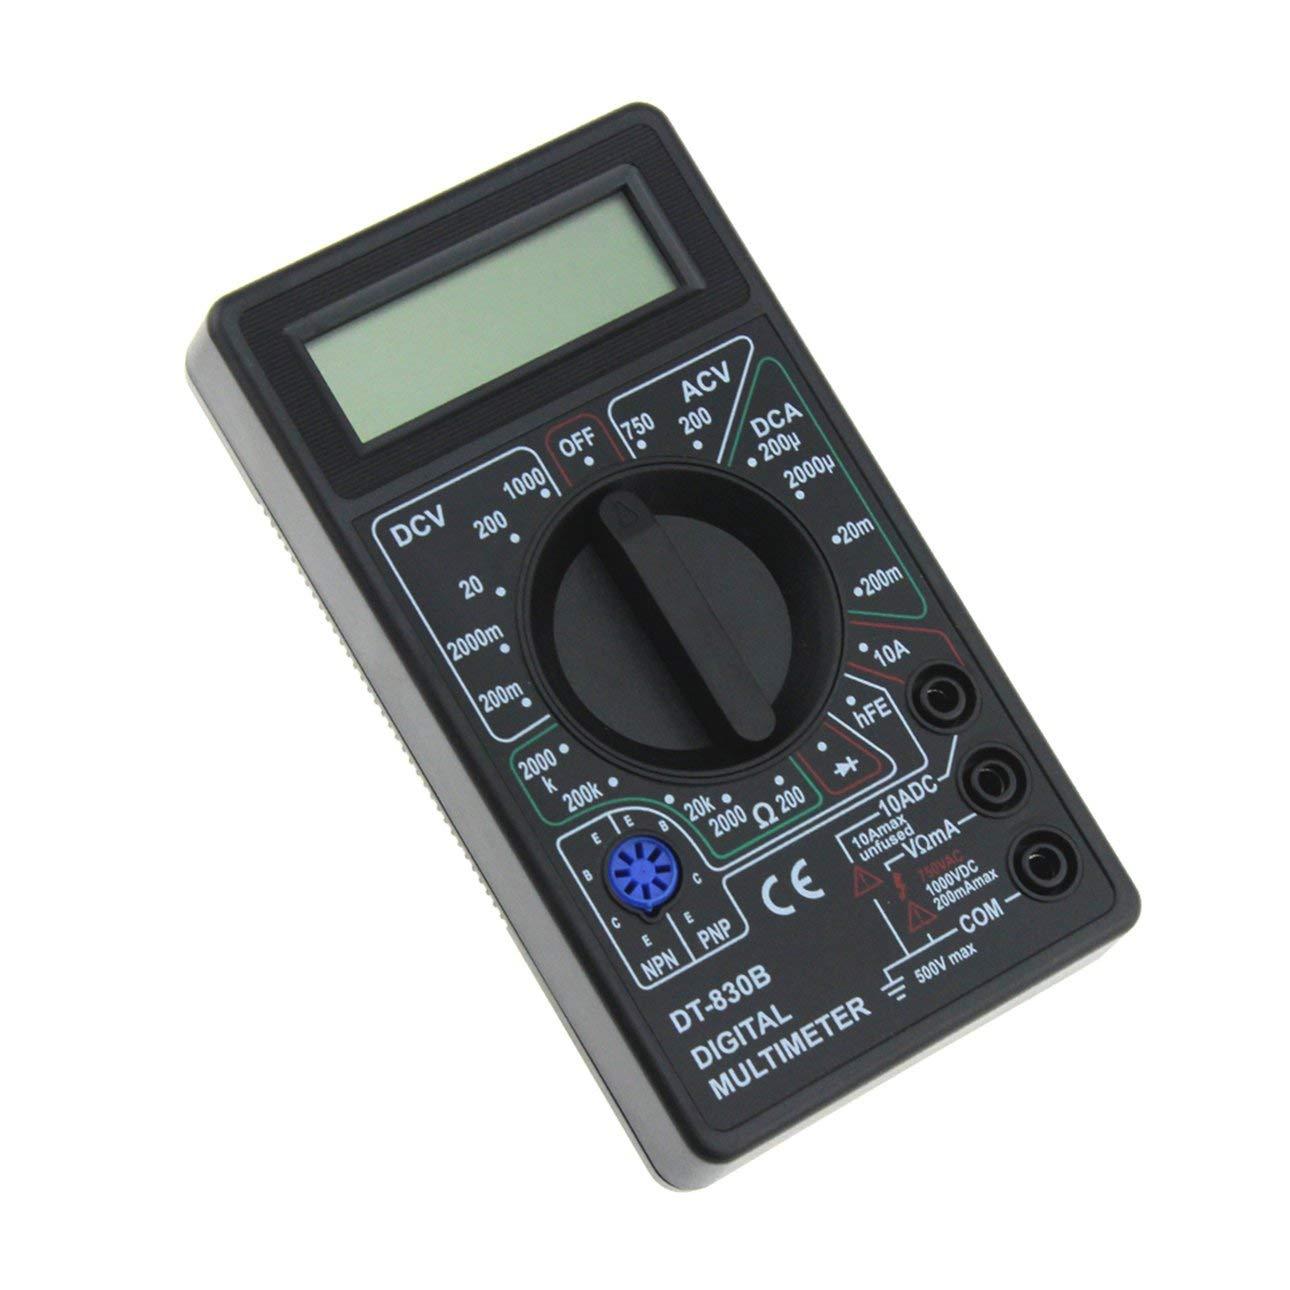 Ballylelly DT-830B Mult/ímetro Digital de Bolsillo Mini 1999 Cuenta AC//DC Voltio Amp Ohm Diodo hFE Probador Amper/ímetro Volt/ímetro Ohm/ímetro